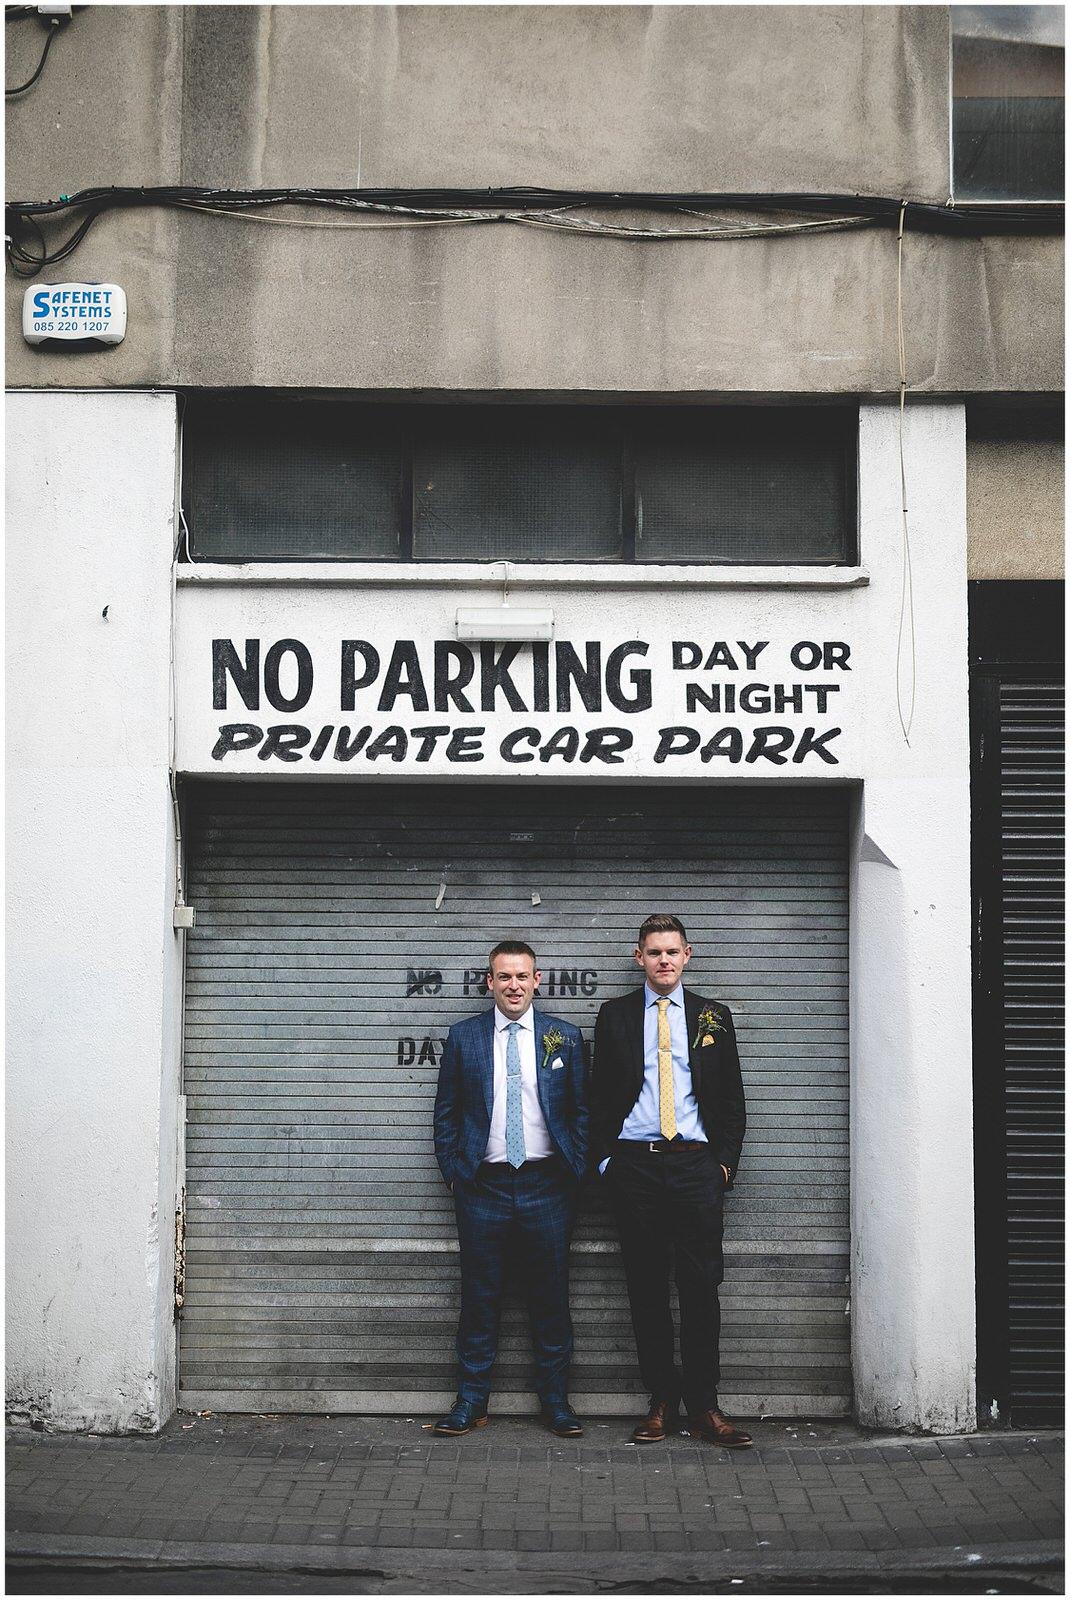 Drury Street 'No Parking day or night'